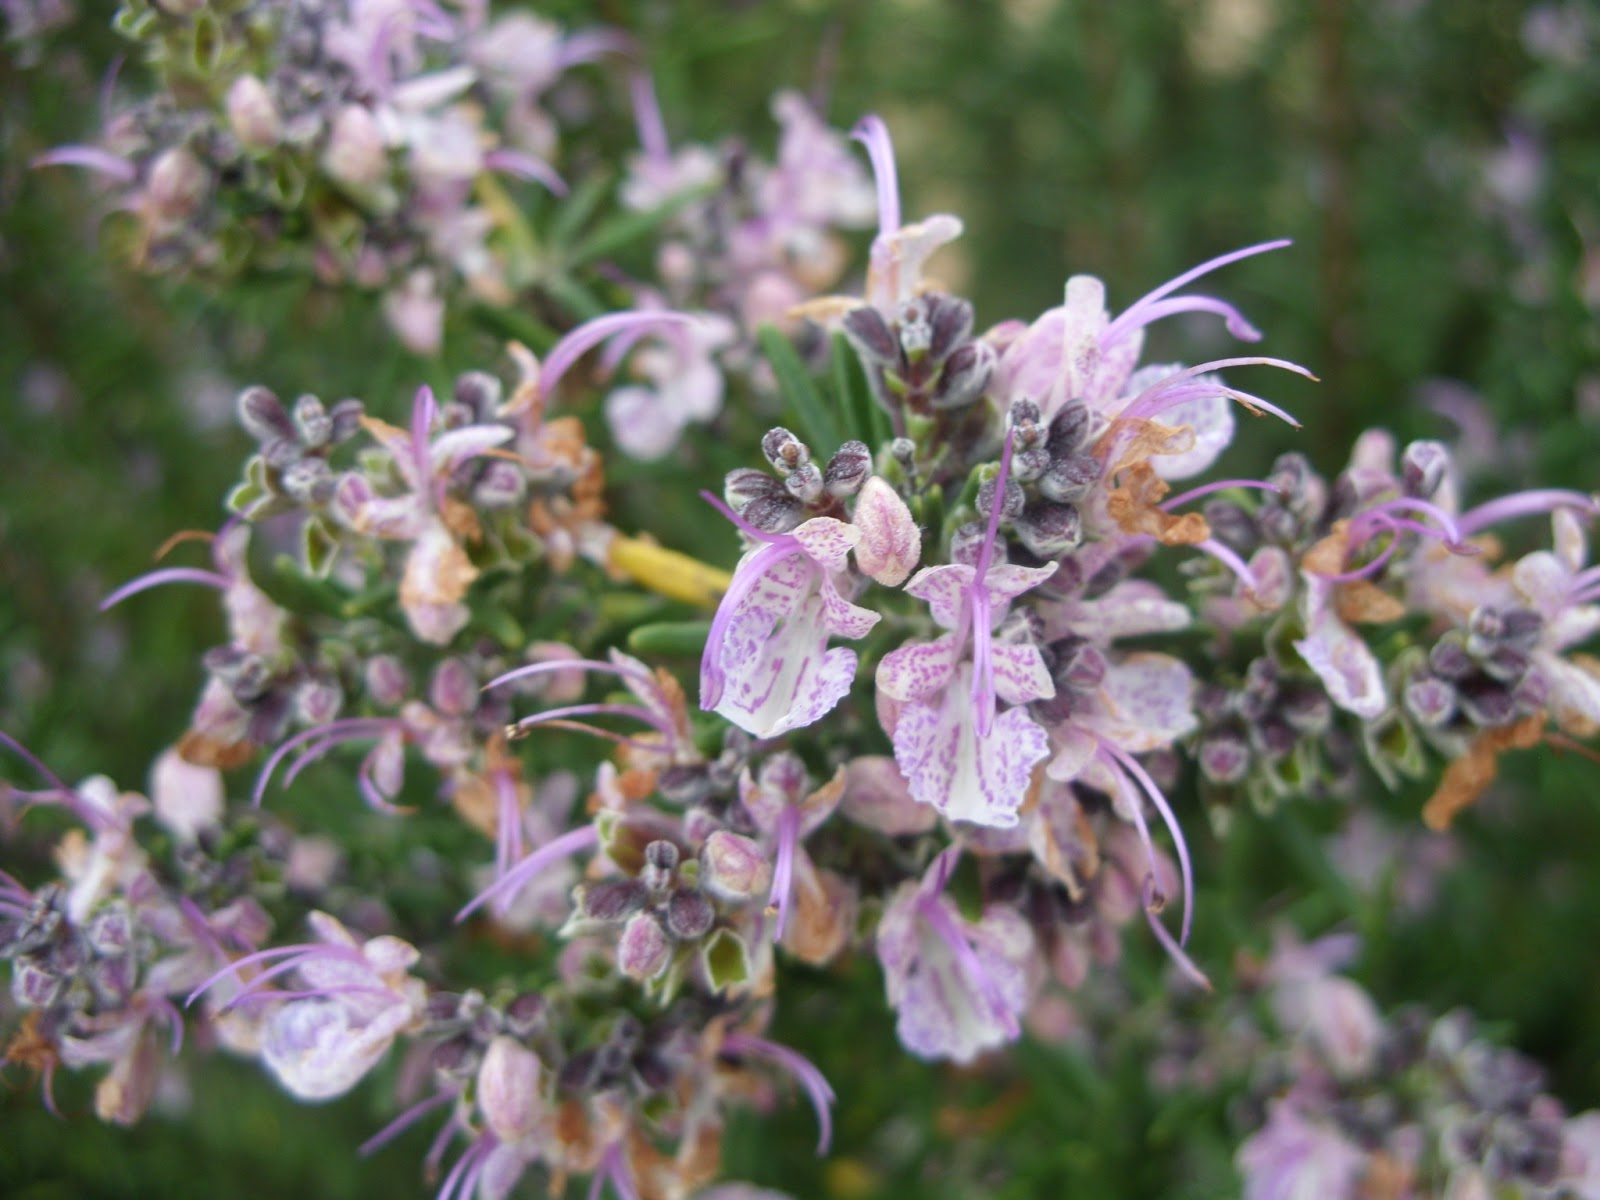 flores no jardim letra:Jardim Autóctone: Alecrim (Rosmarinus officinalis)